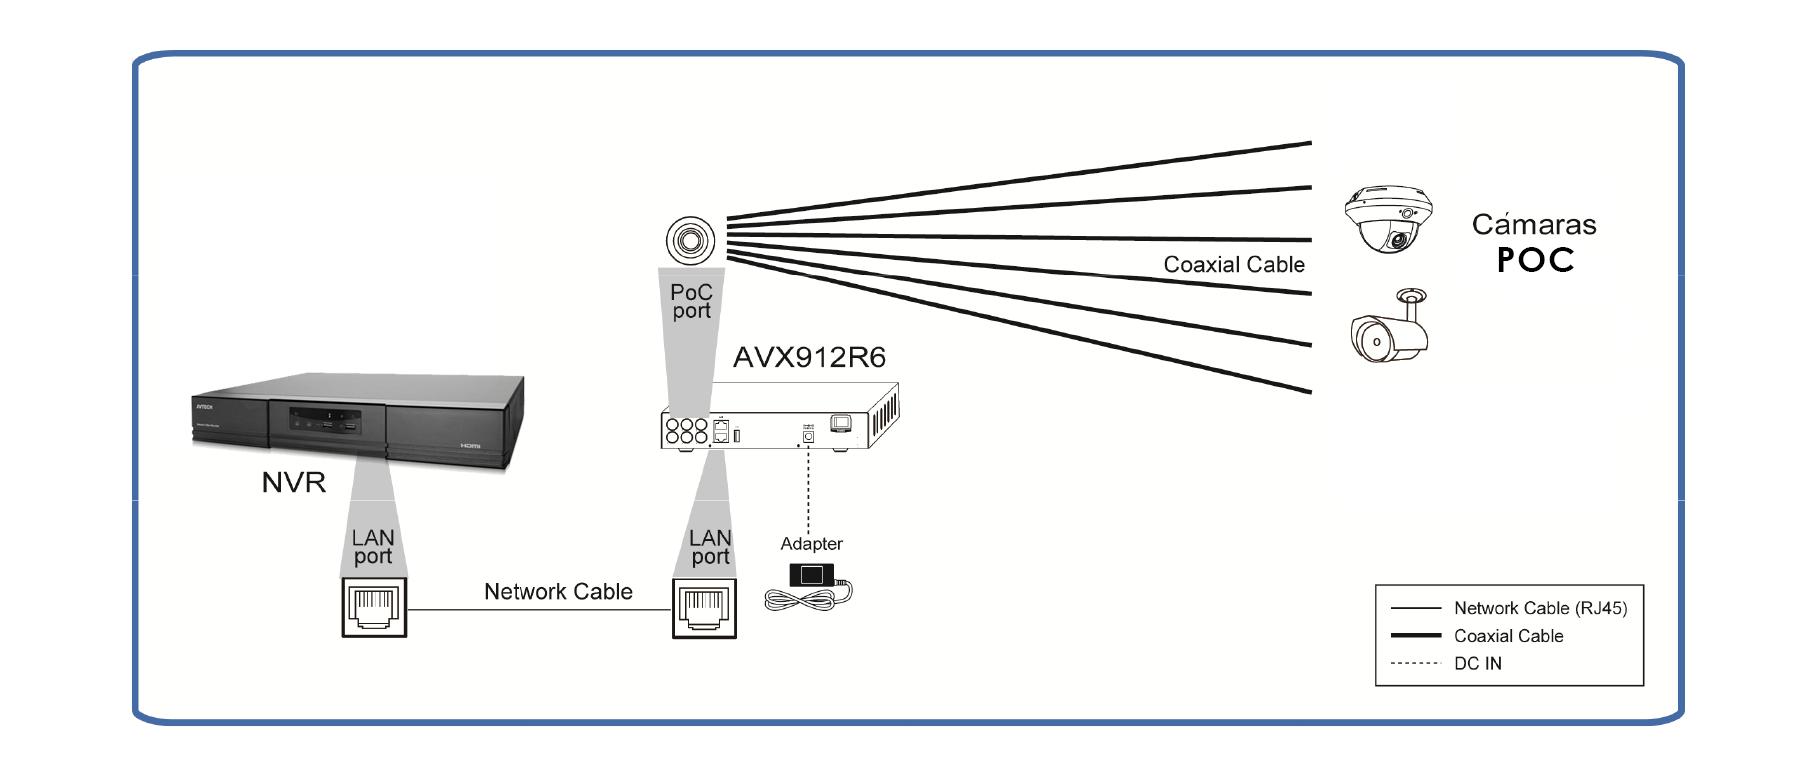 AVX912R6_Diagrama